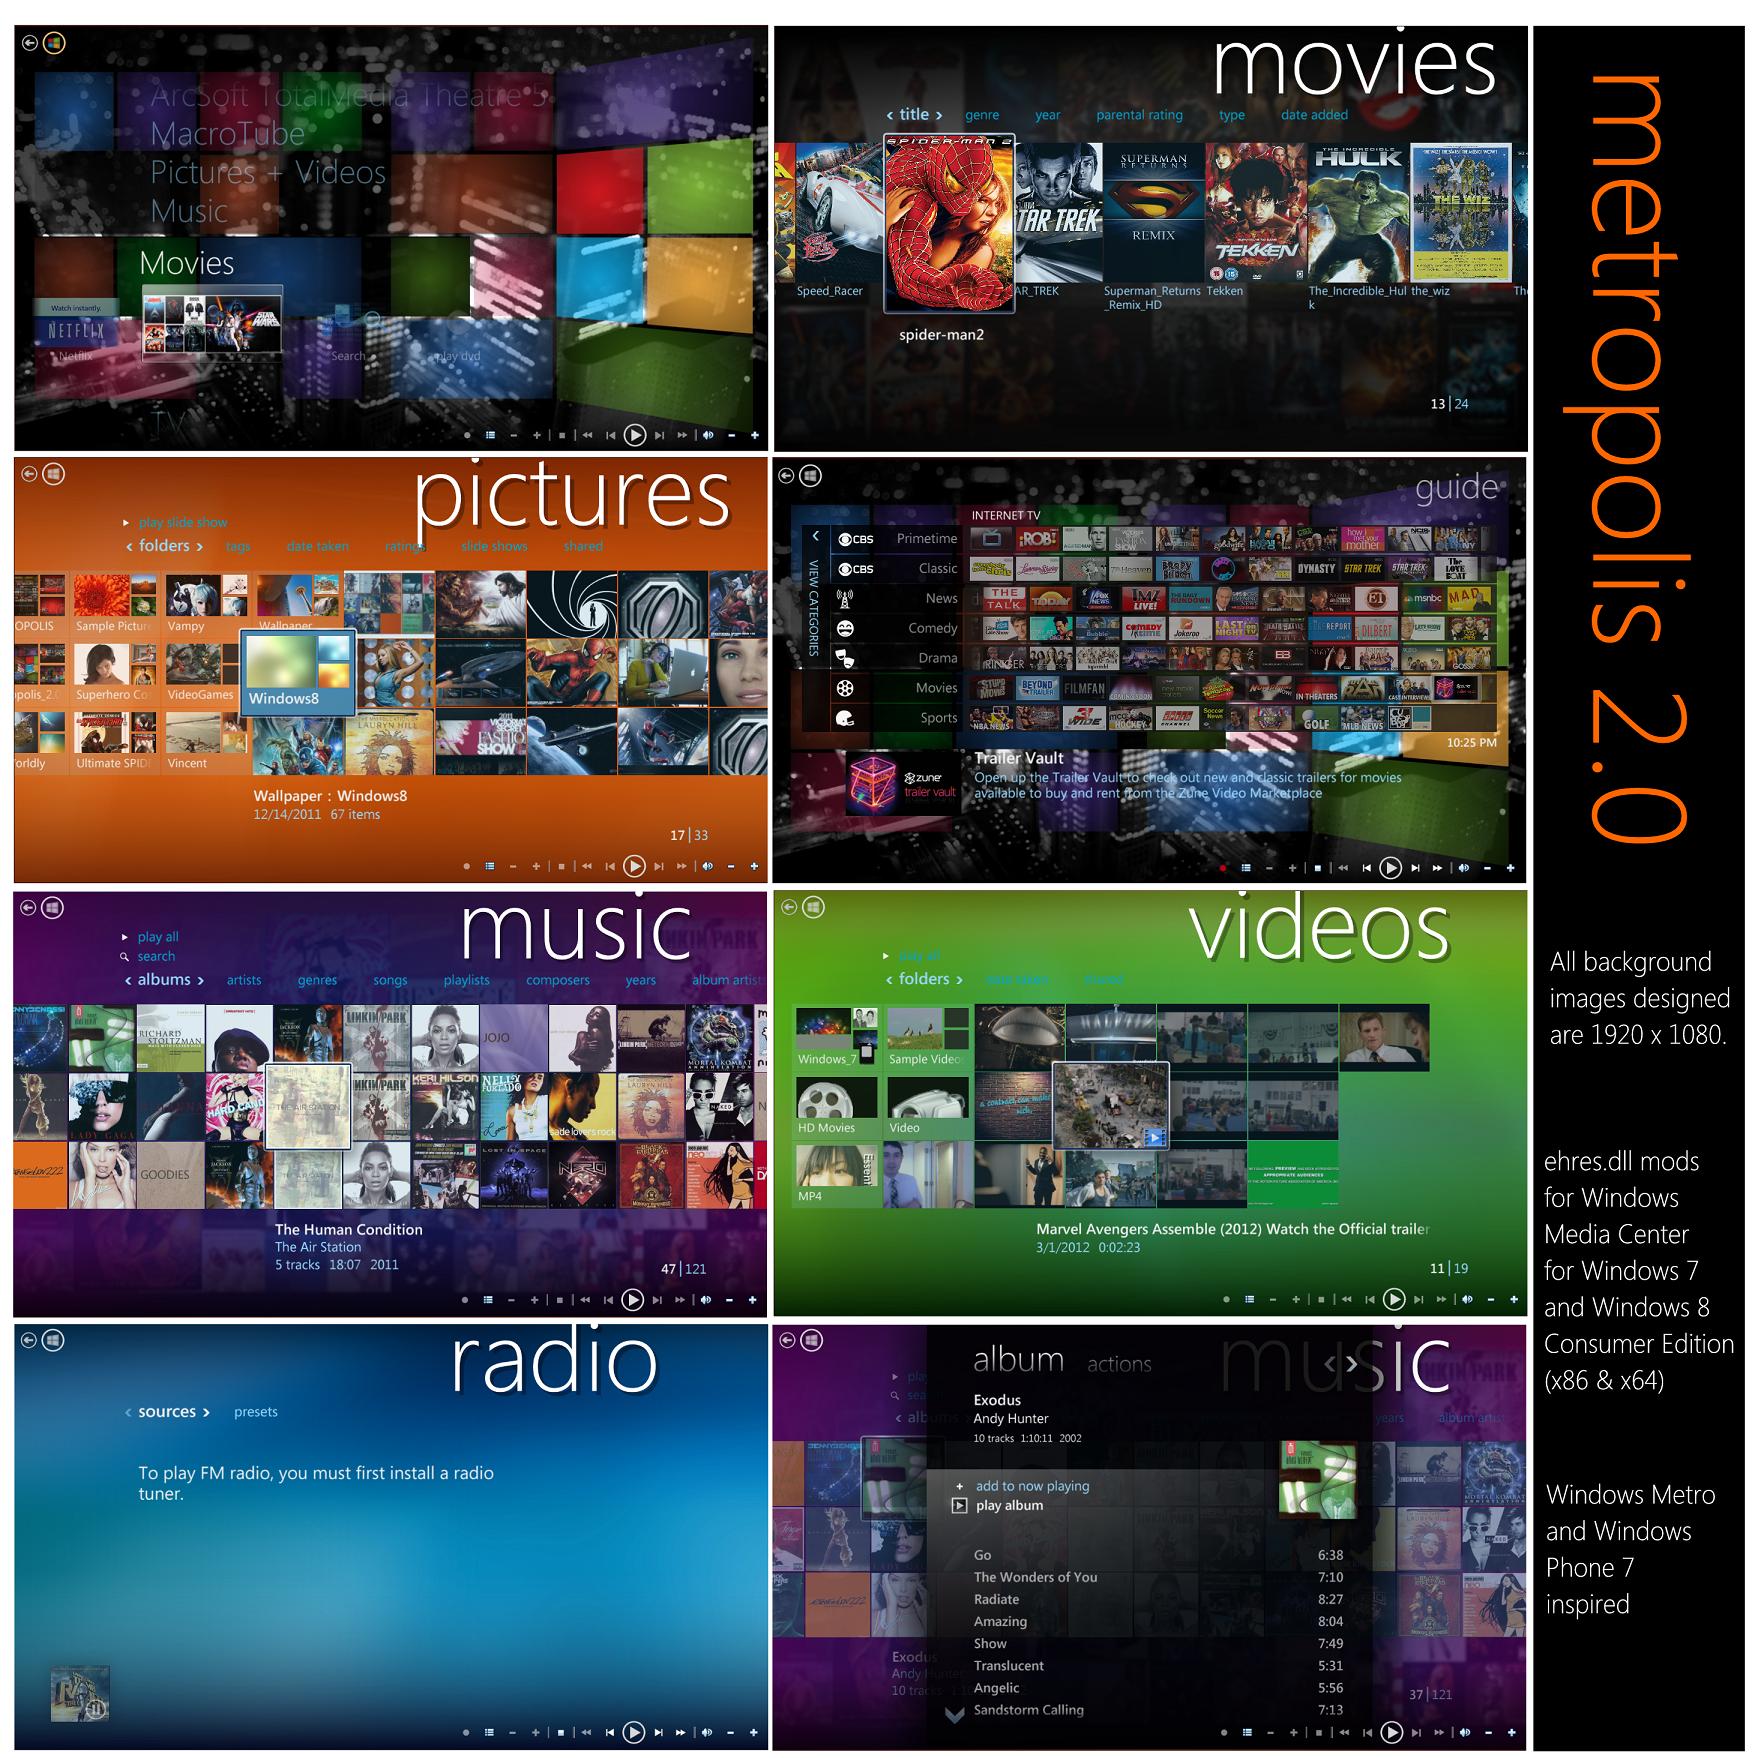 metropolis 2 0 - Windows Media Center Mod by octogonpc on